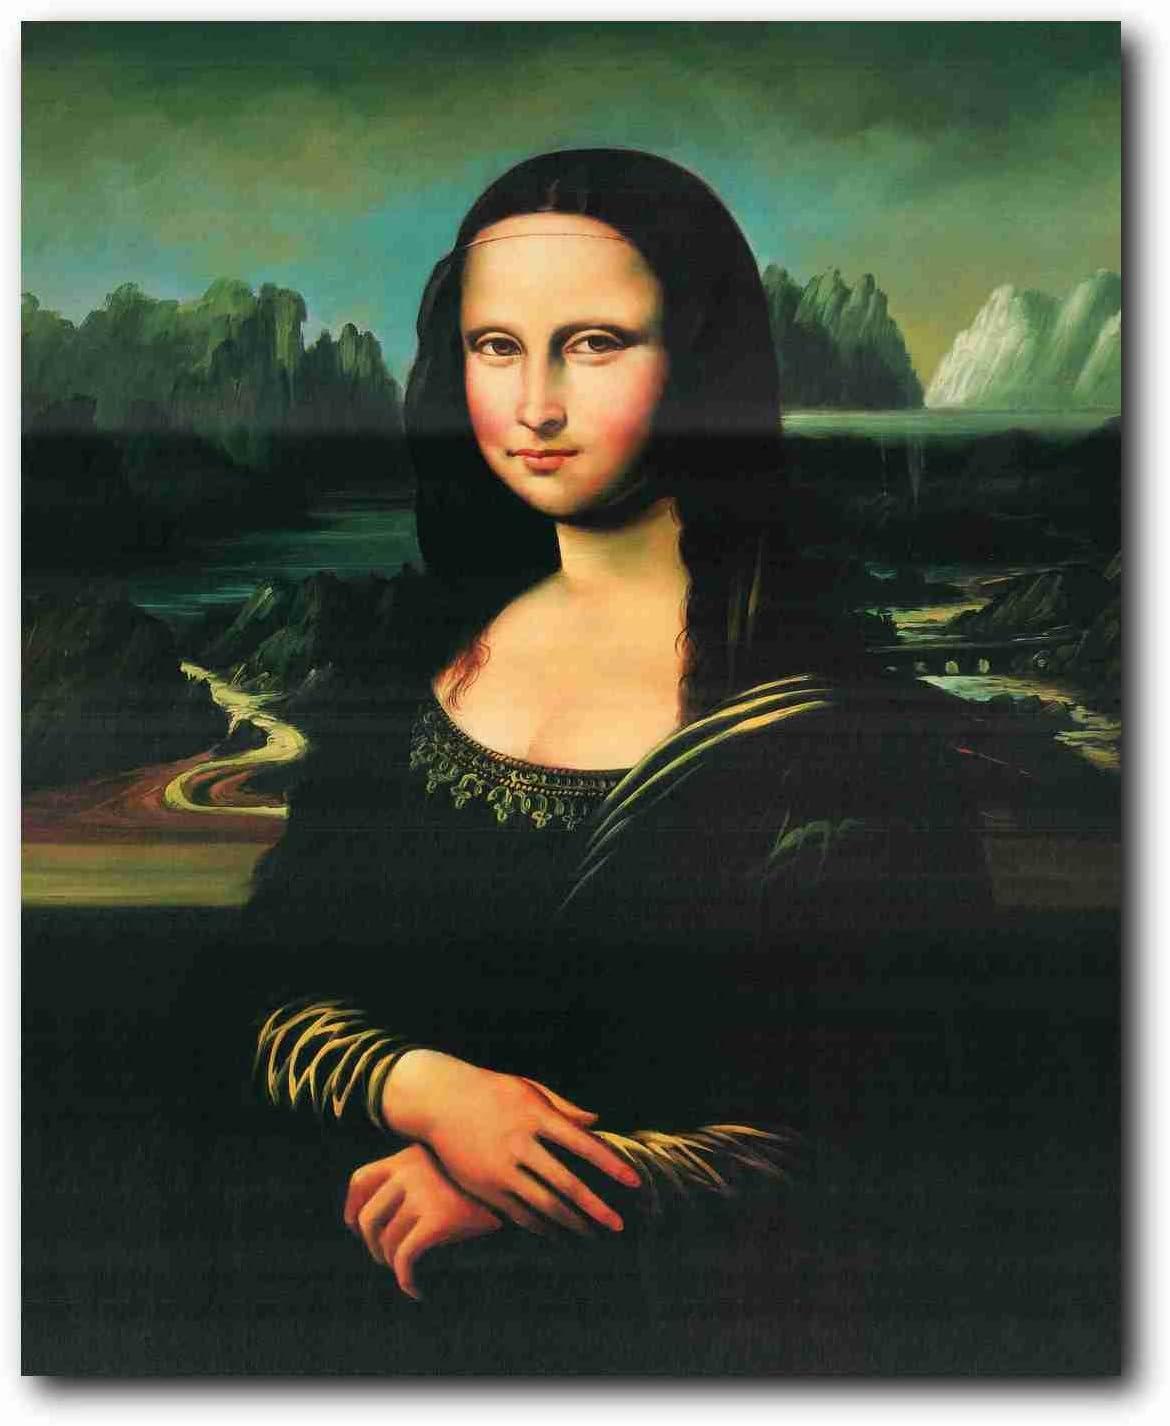 Famous Mona Lisa by Leonardo da Vinci Wall Poster Prints Masterpiece Decoration